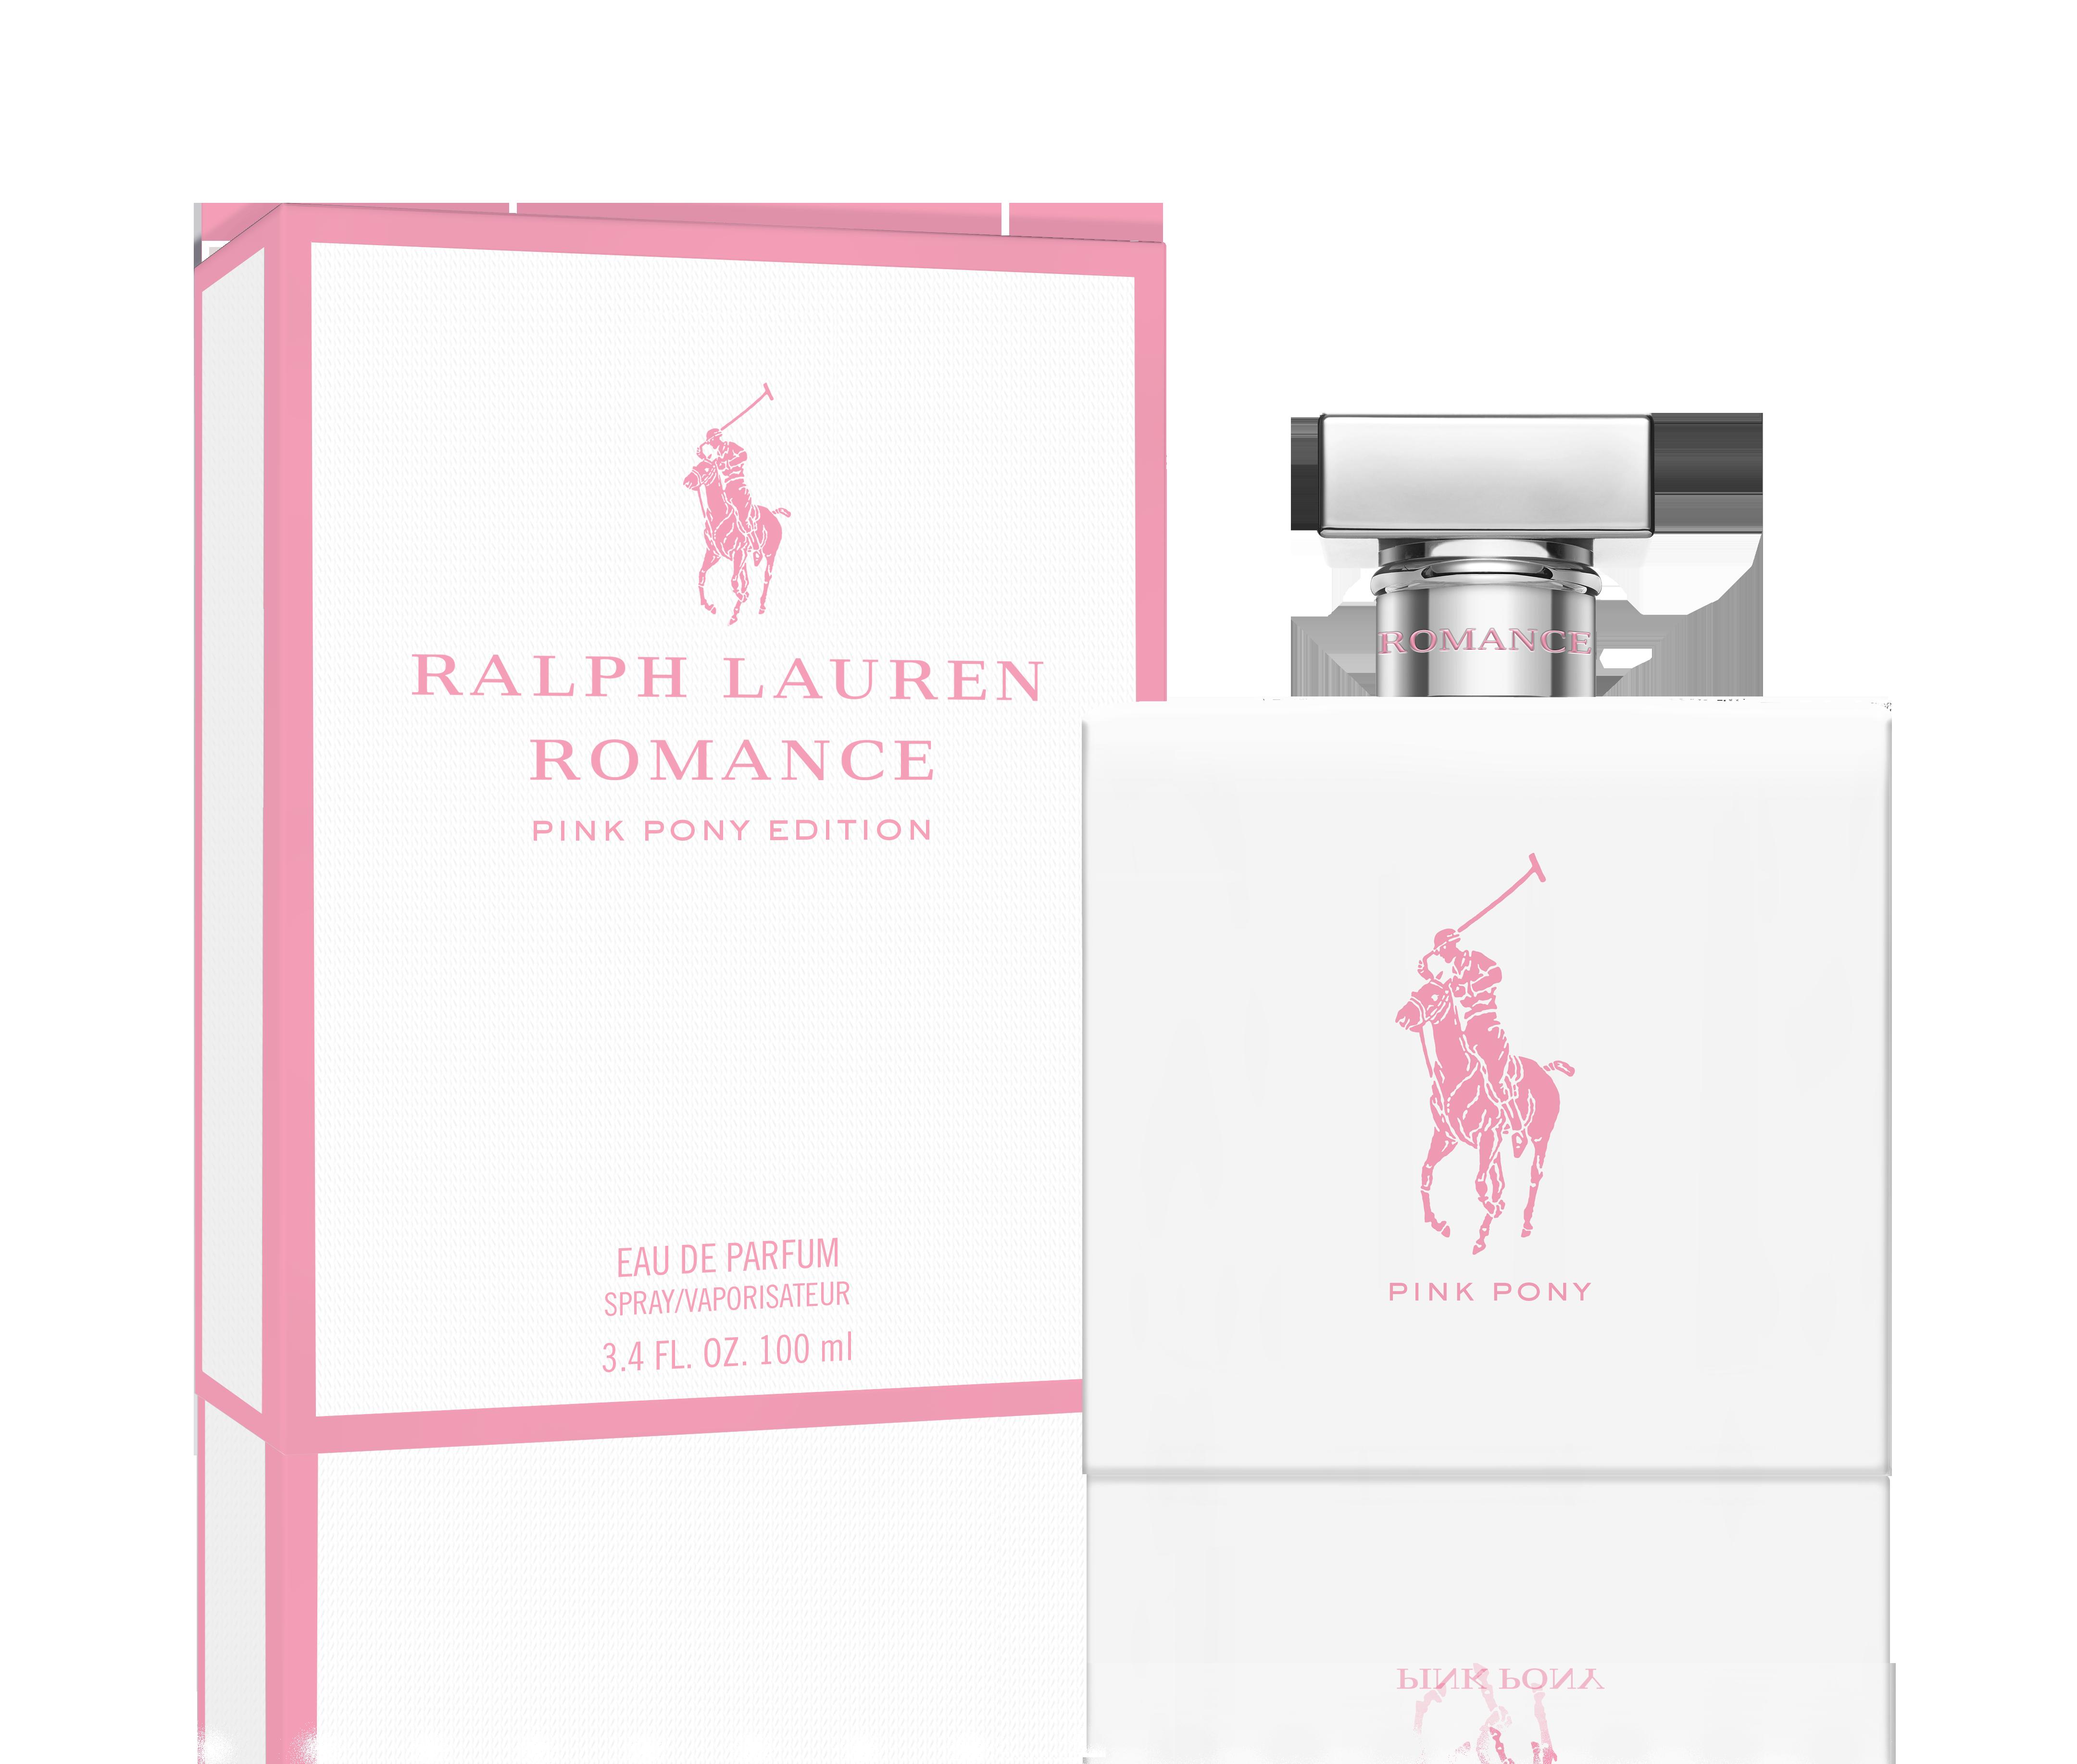 perfume de Ralph Lauren, cancer awareness